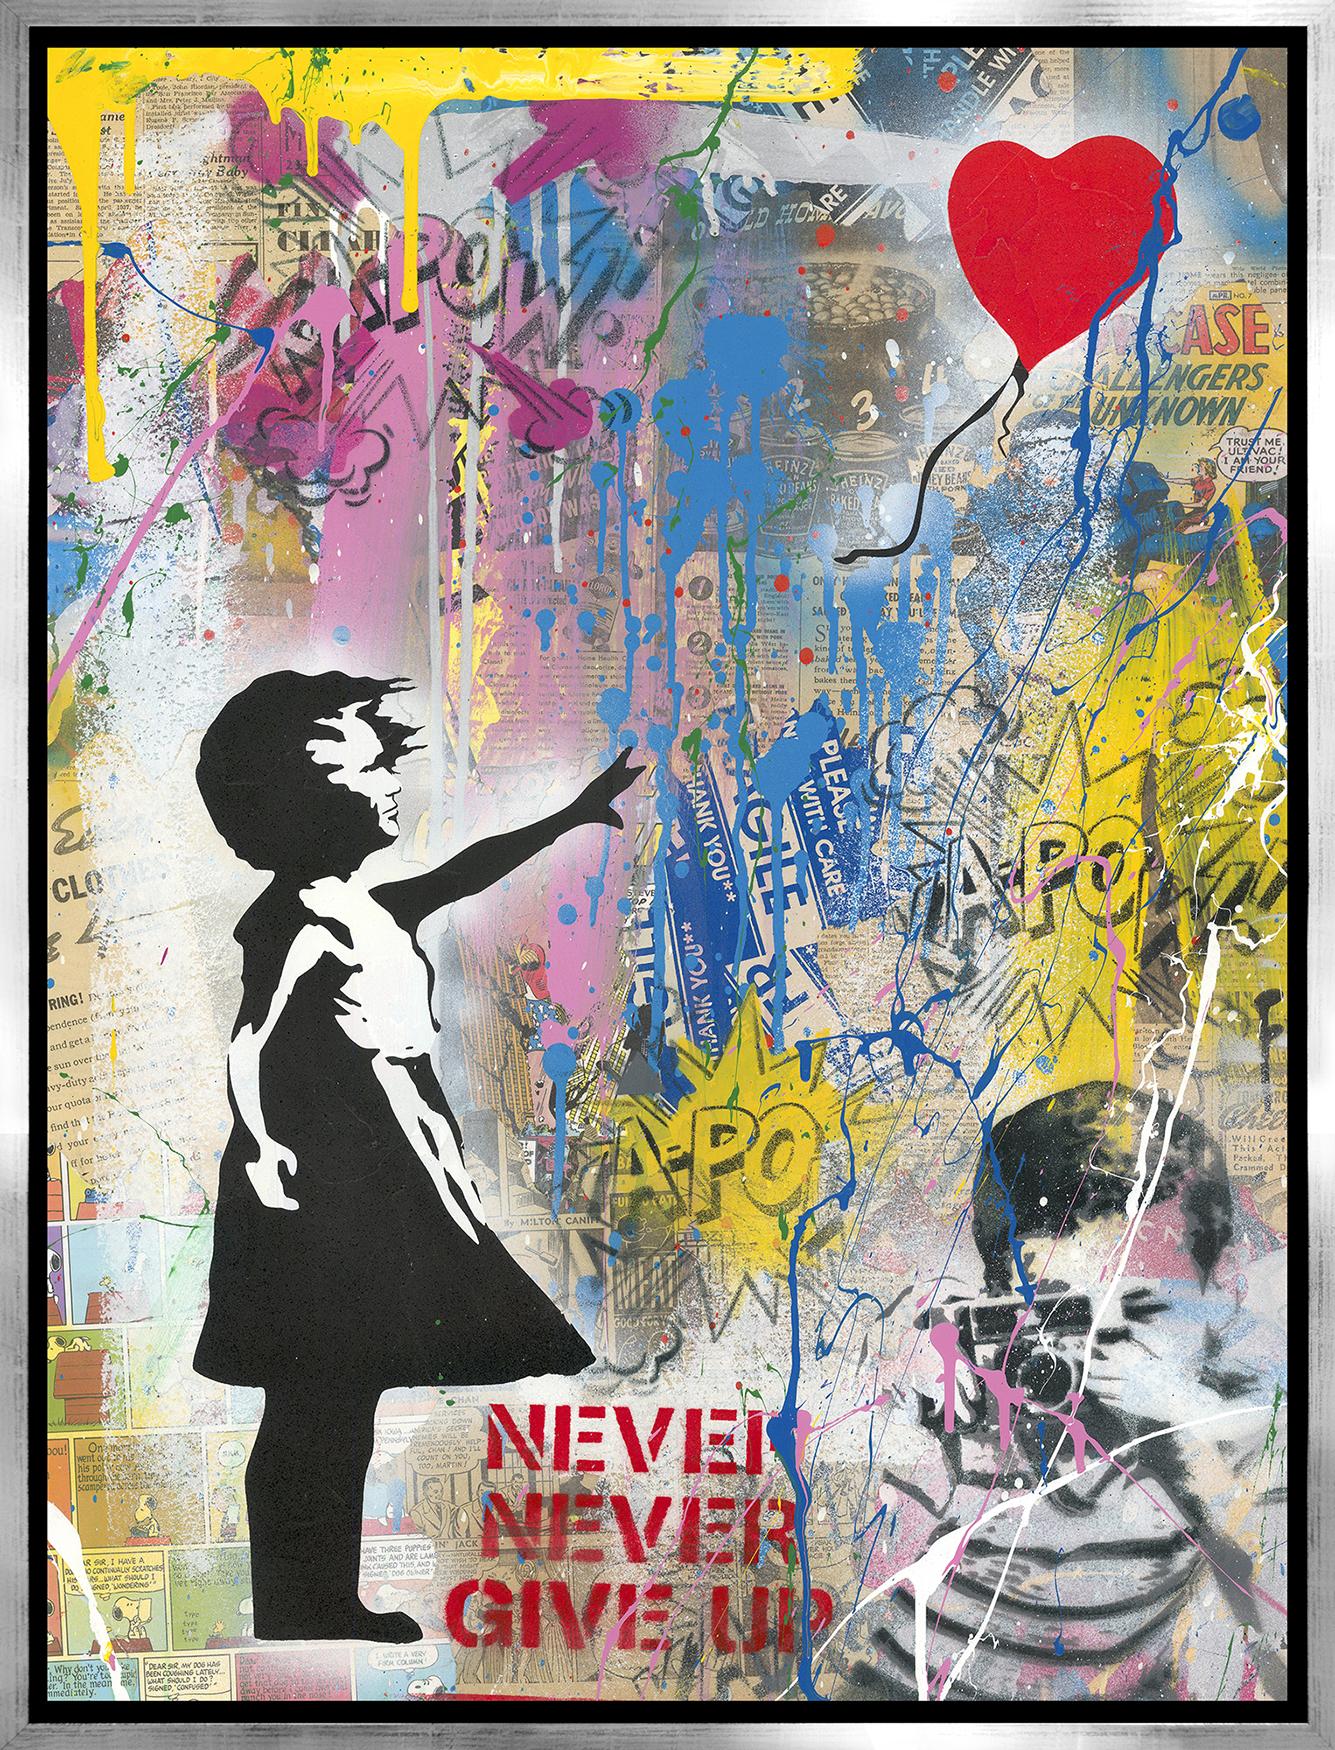 Mr. Brainwash - Balloon Girl , 9003-012-102